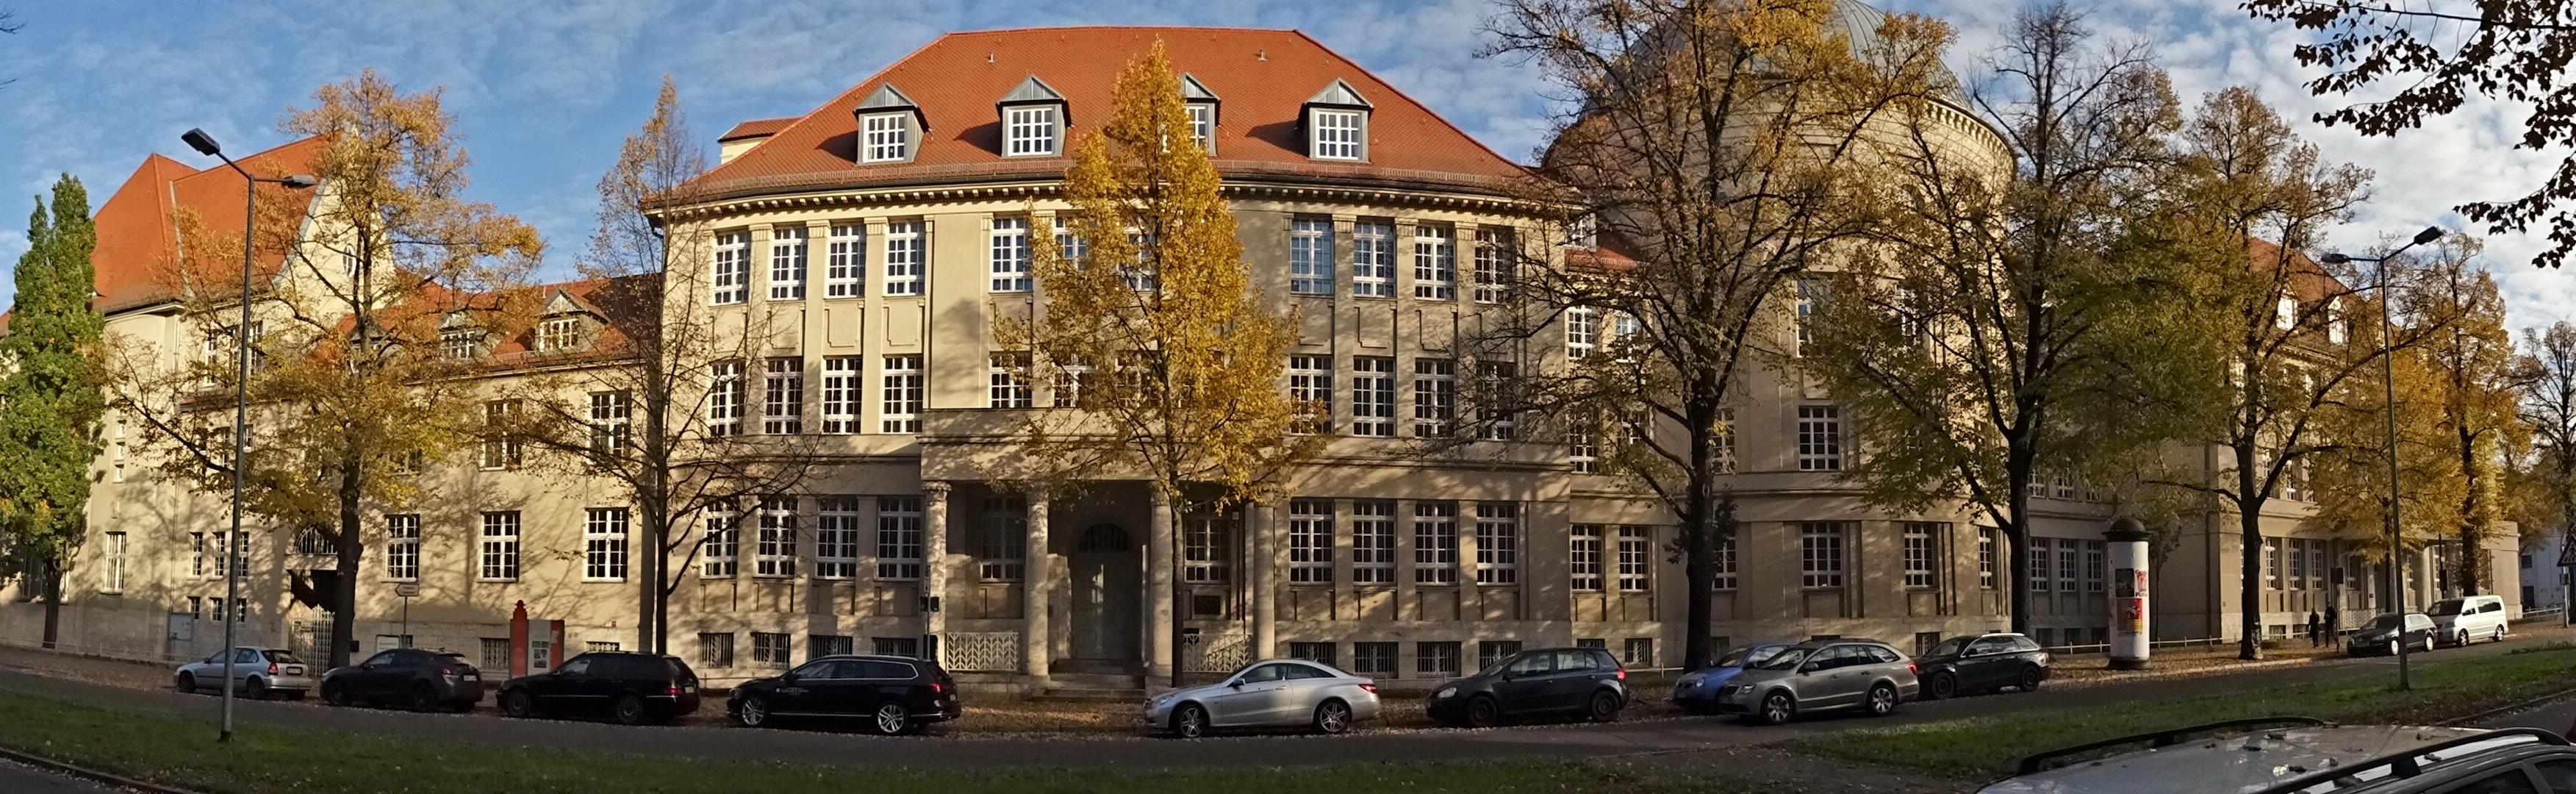 Hegel Gymnasium Magdeburg